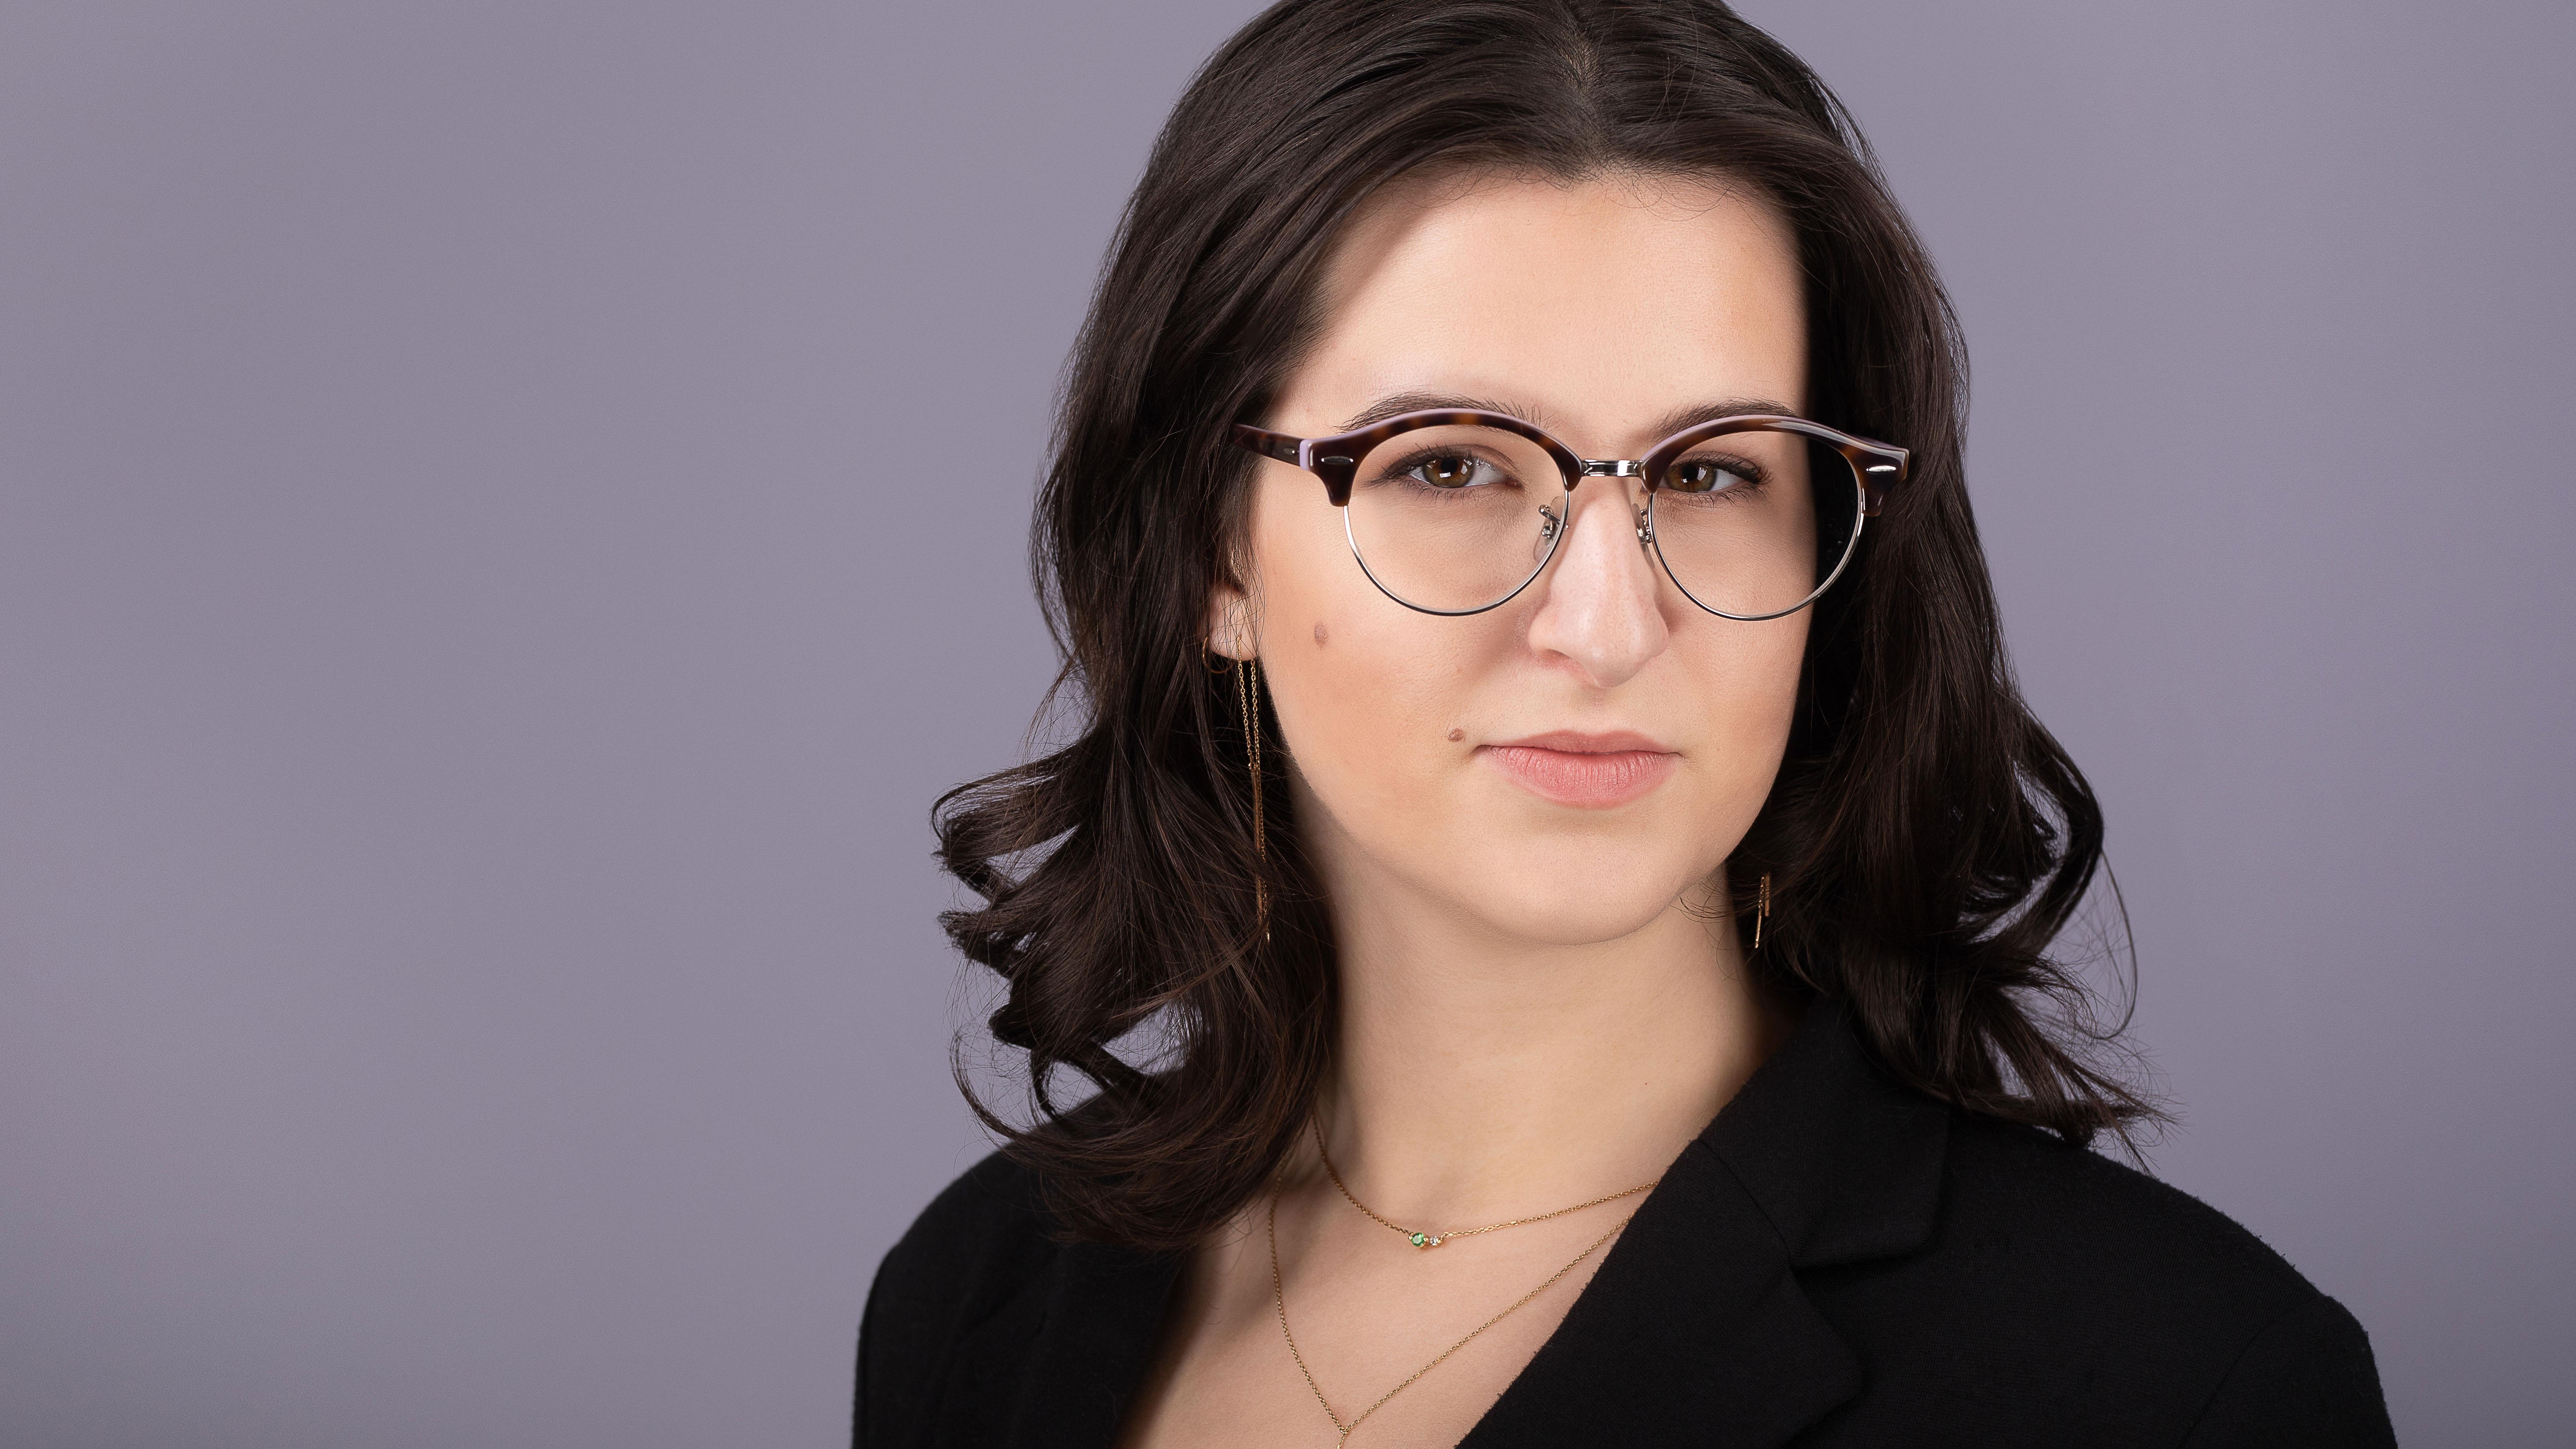 Zoe Hurley (1 of 1)